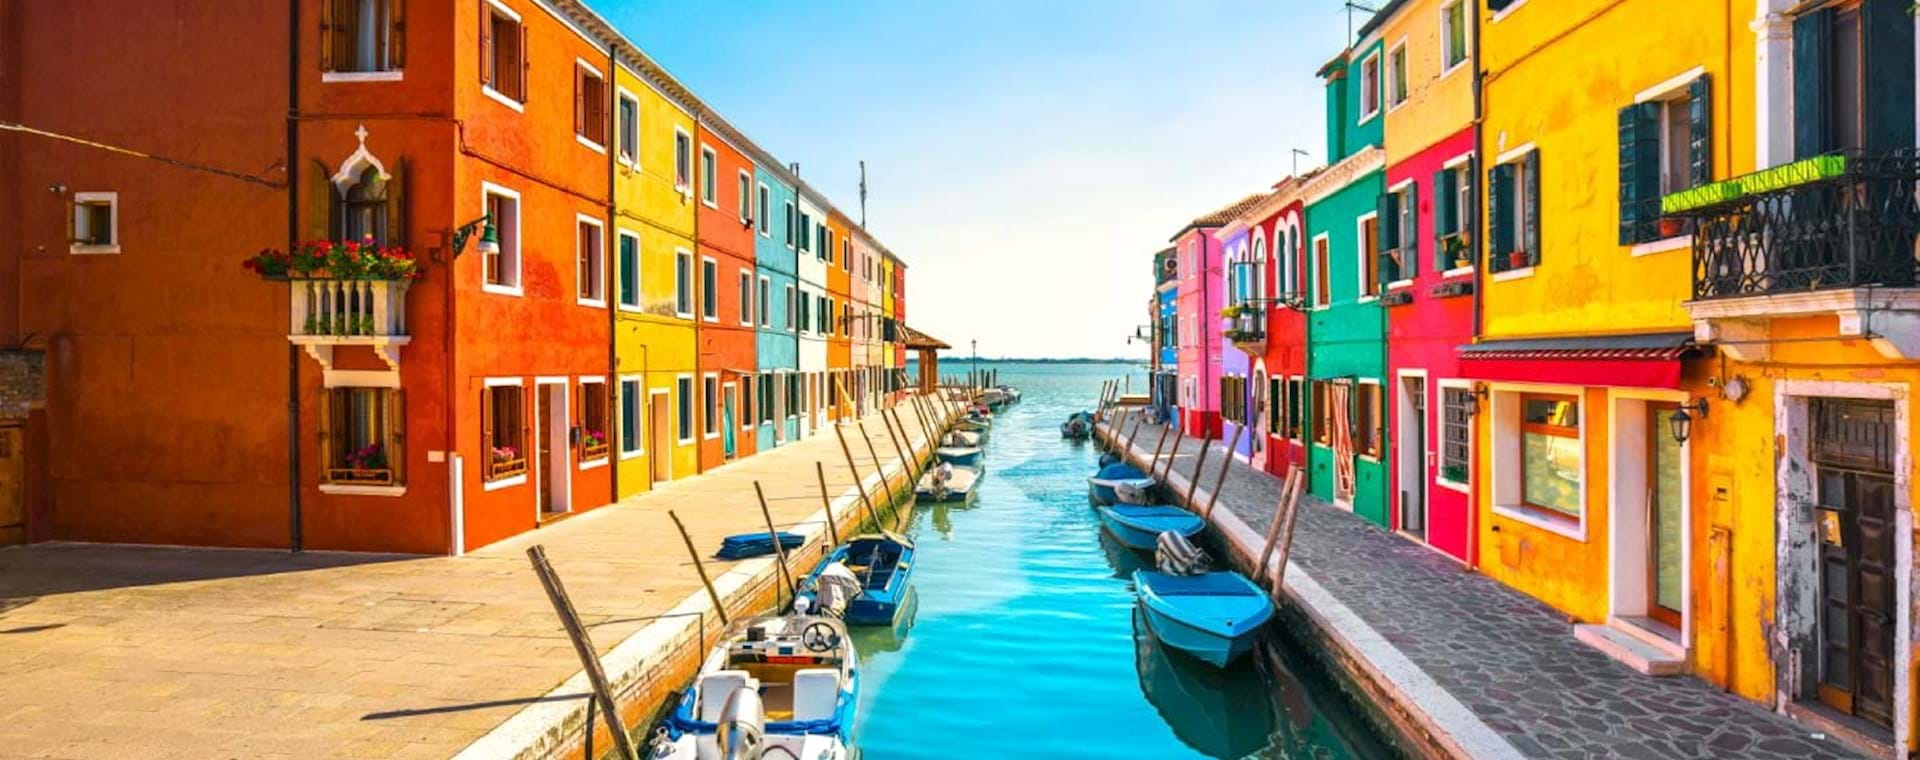 VIP Venetian Islands: Murano, Burano & Torcello by Private Water Taxi